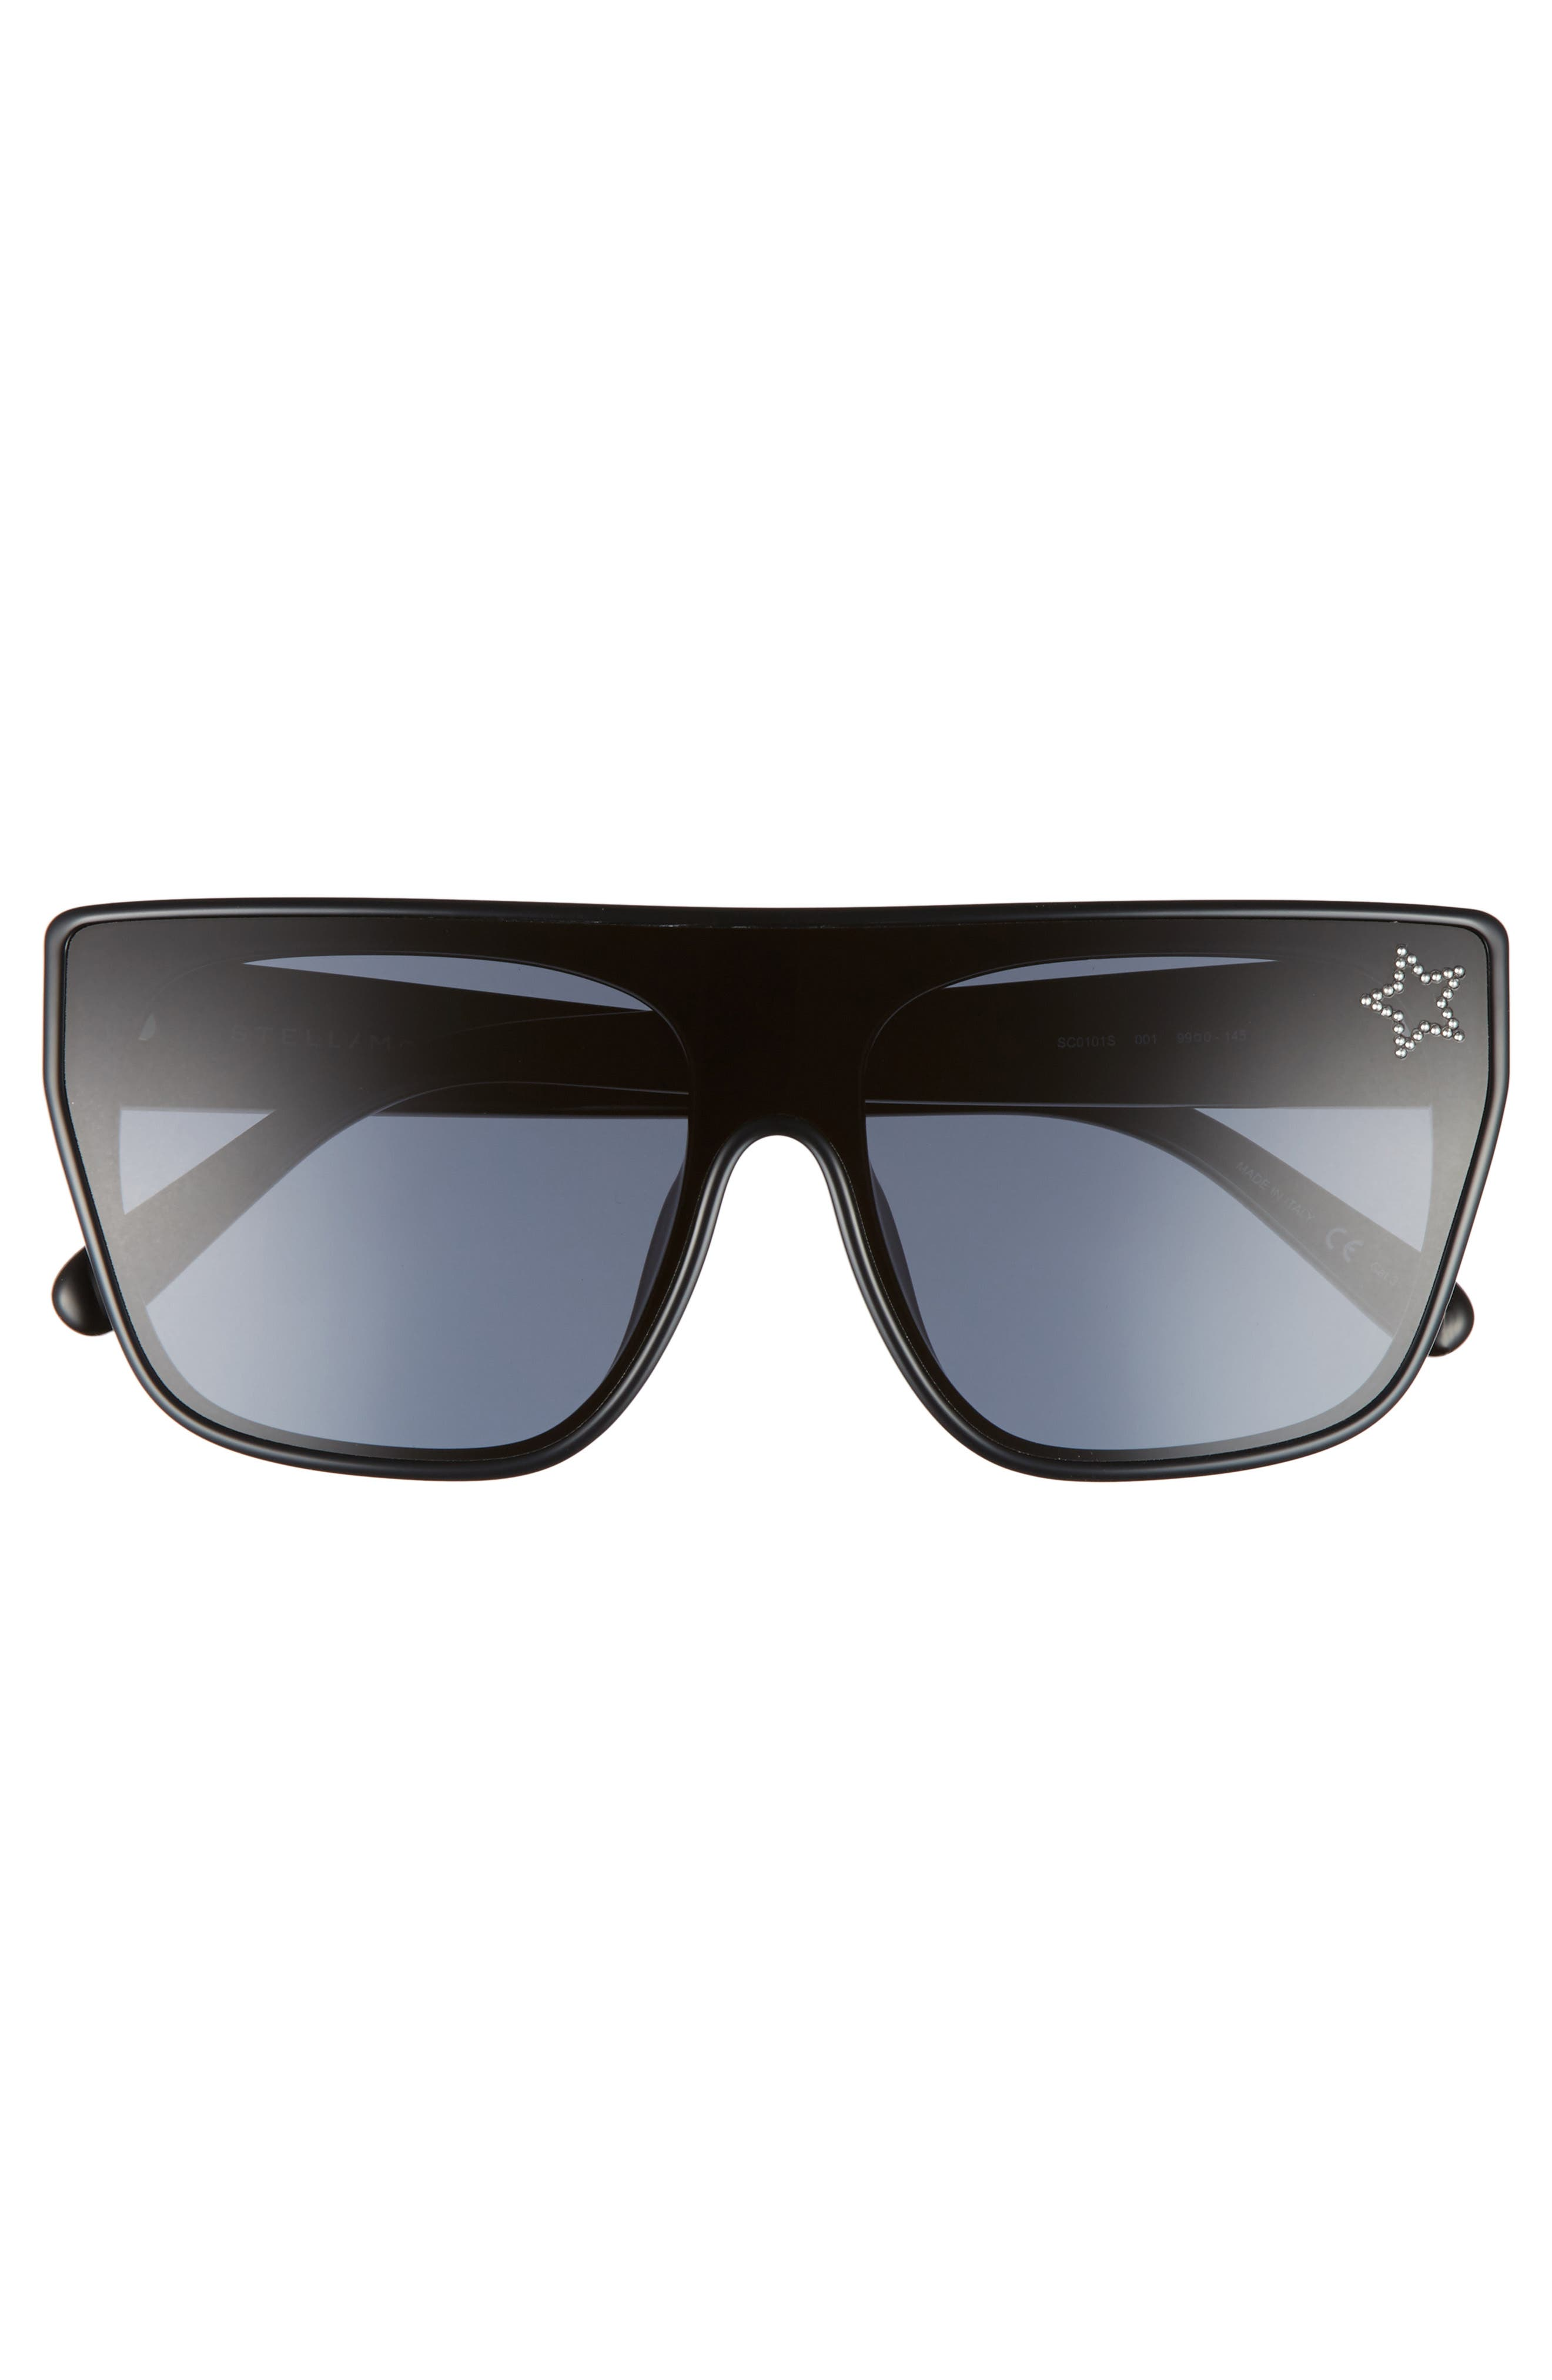 99mm Flat Top Sunglasses,                             Alternate thumbnail 3, color,                             BLACK